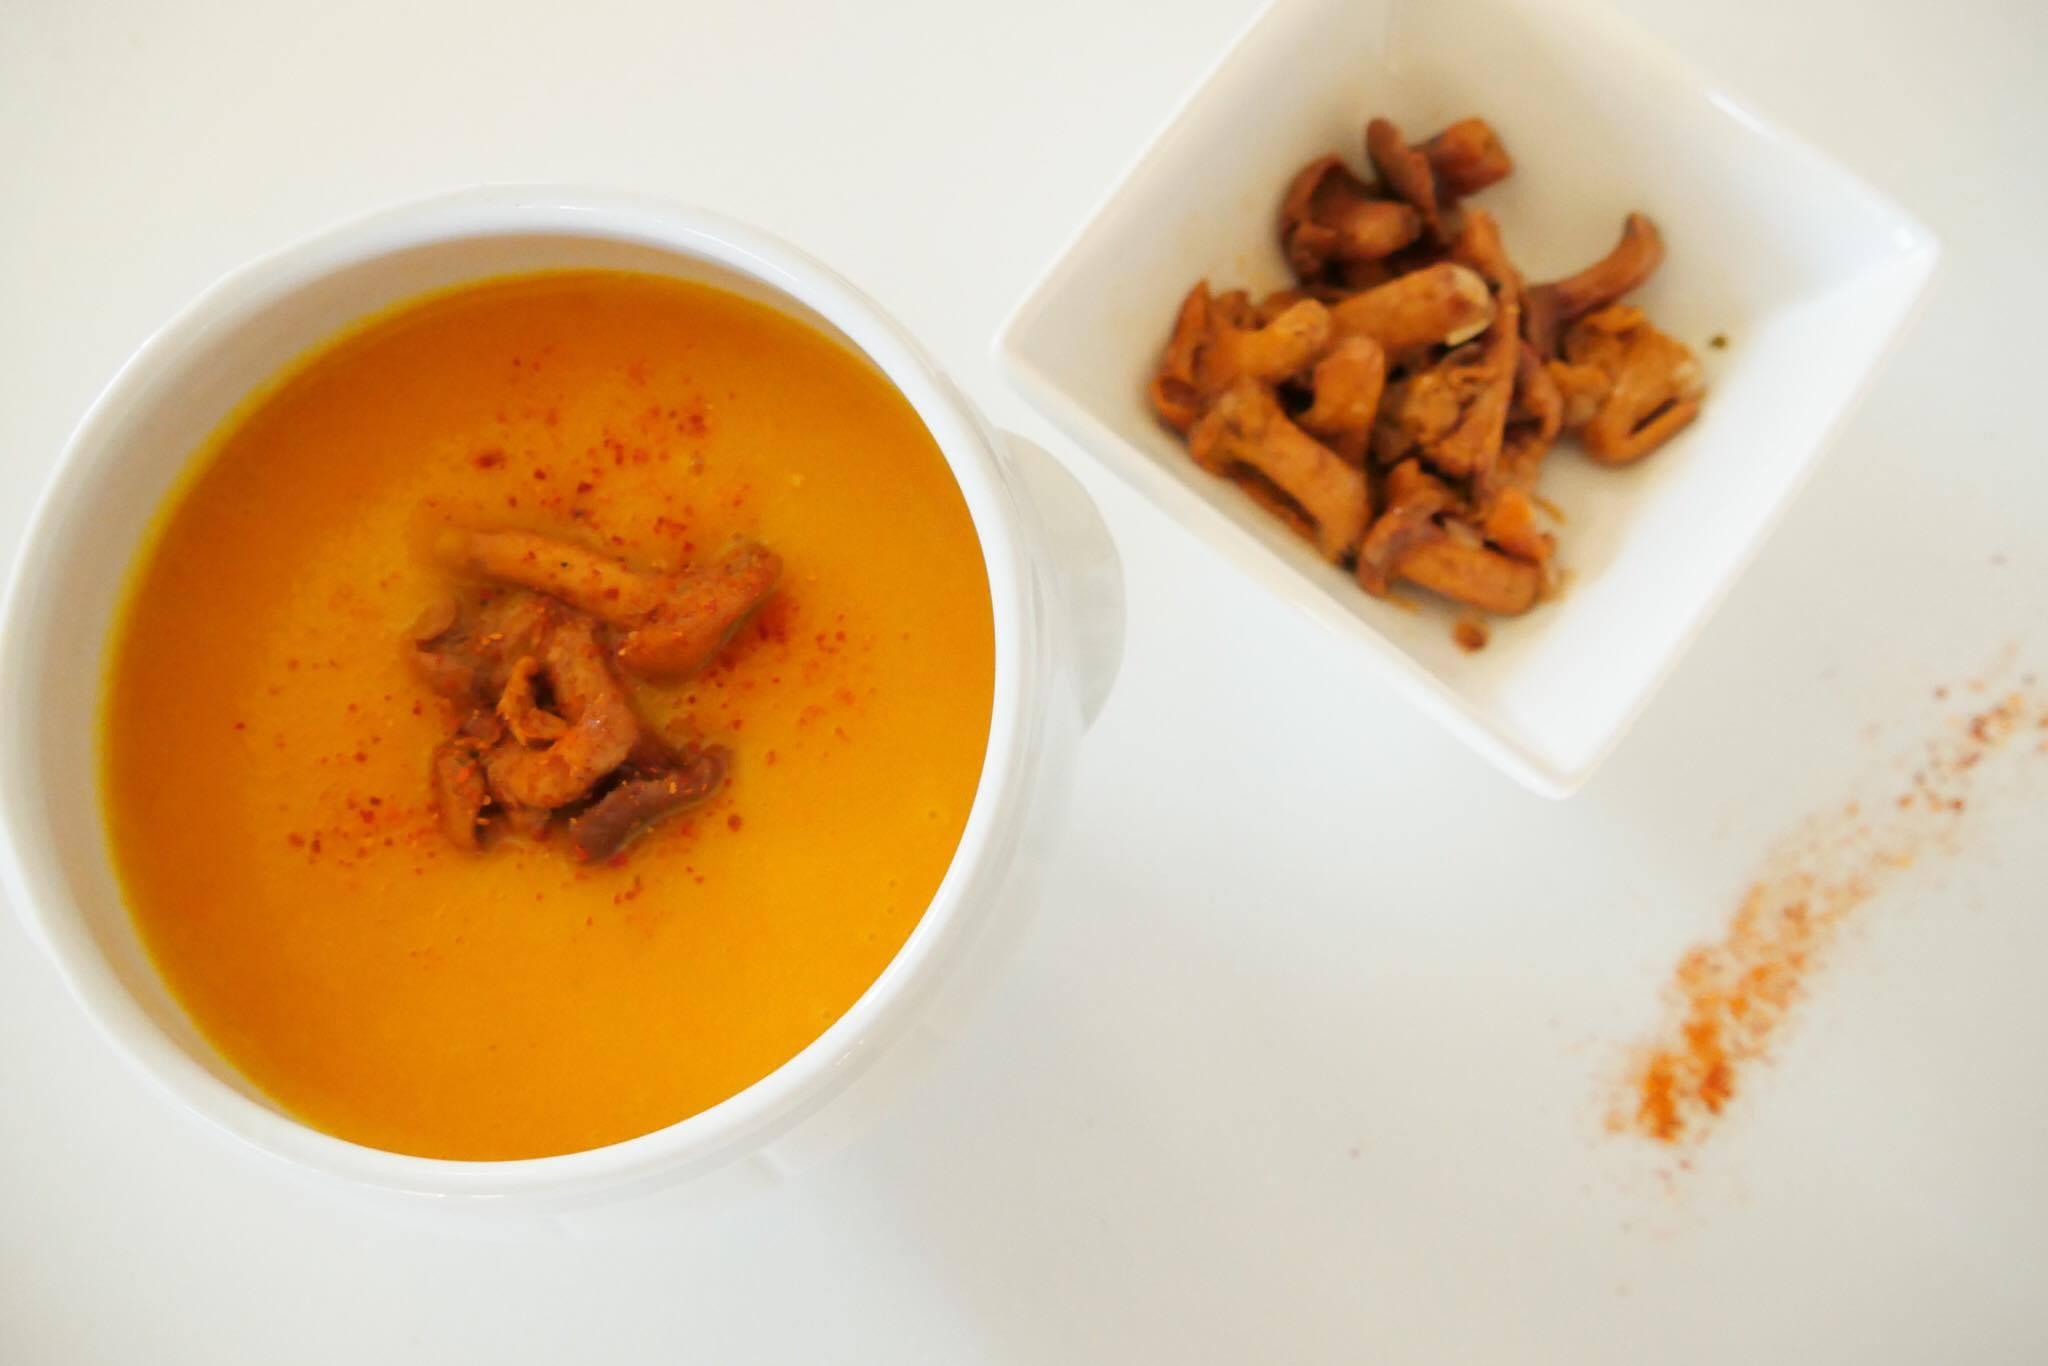 recette facile soupe potiron potimarron healthy manger sain